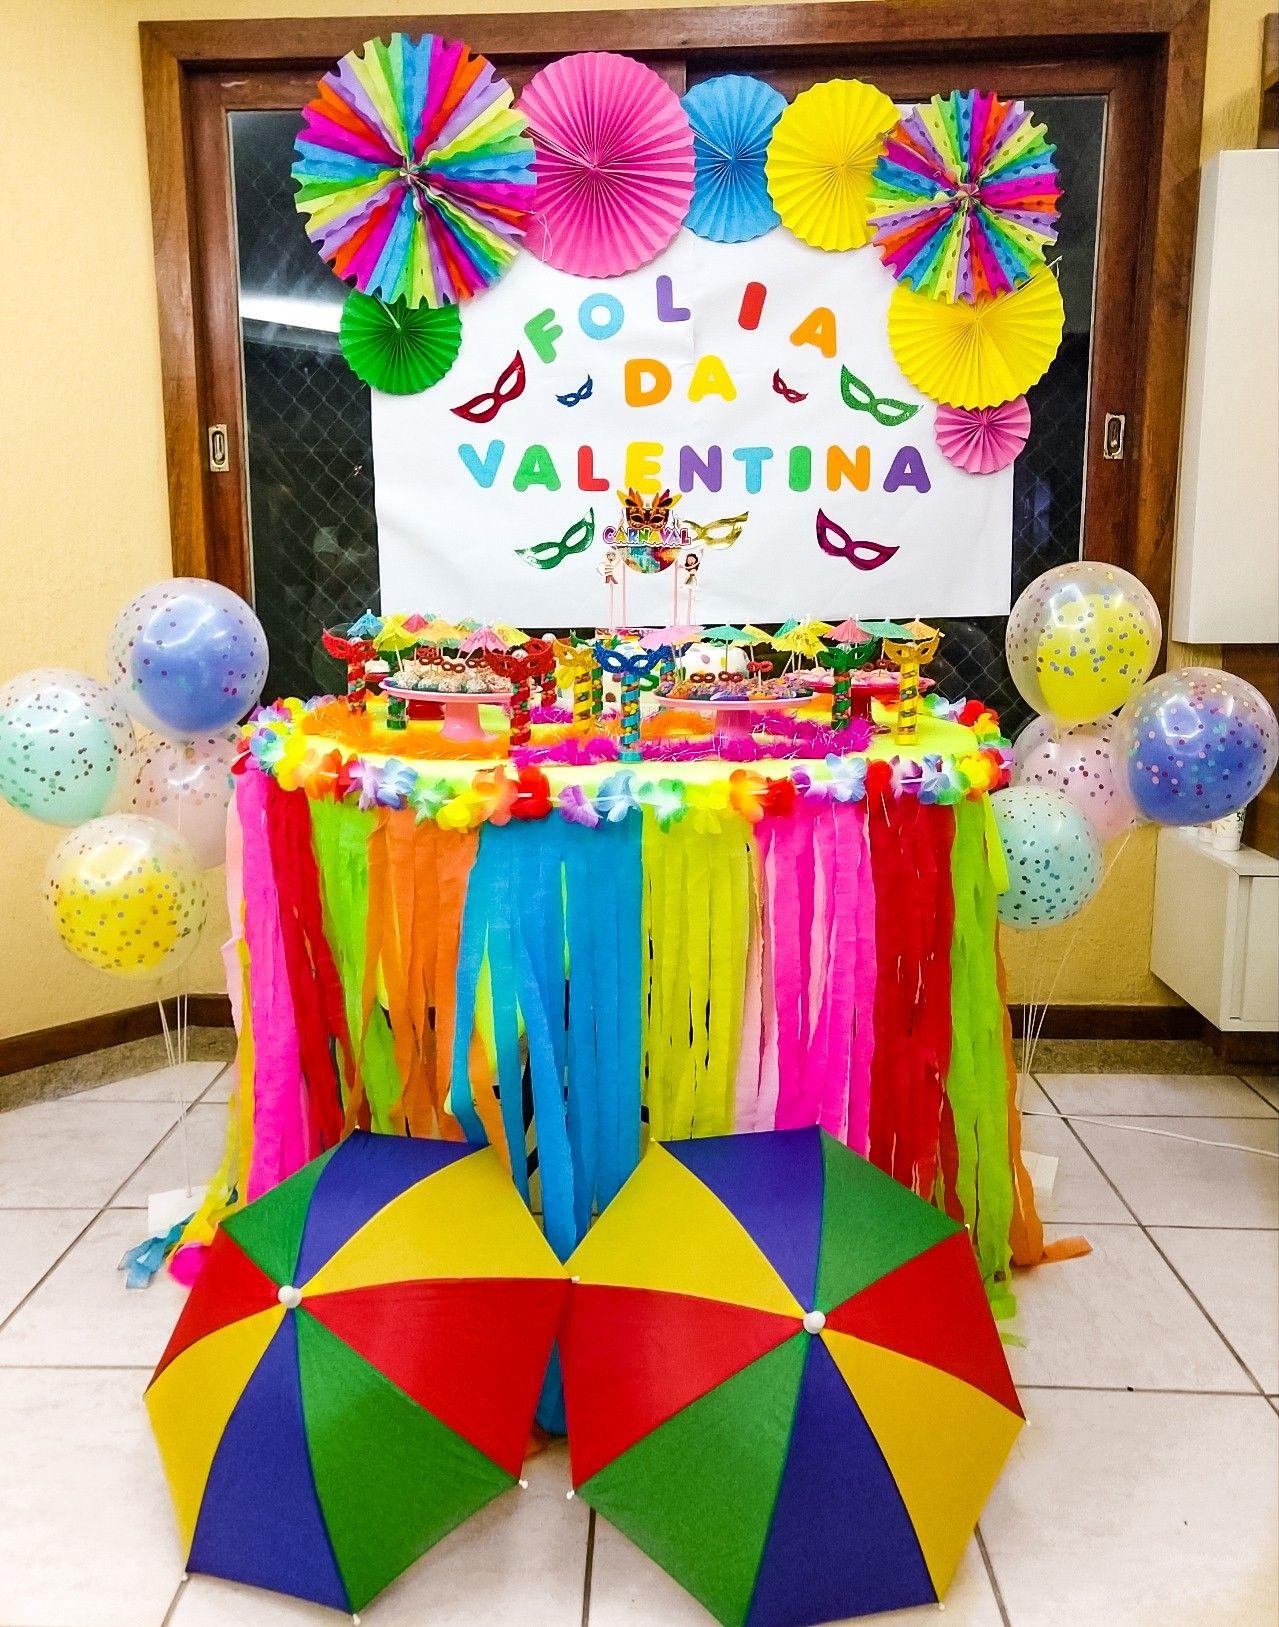 Festa De Mesversario Tema Carnaval Ideias Inspiradoras Da